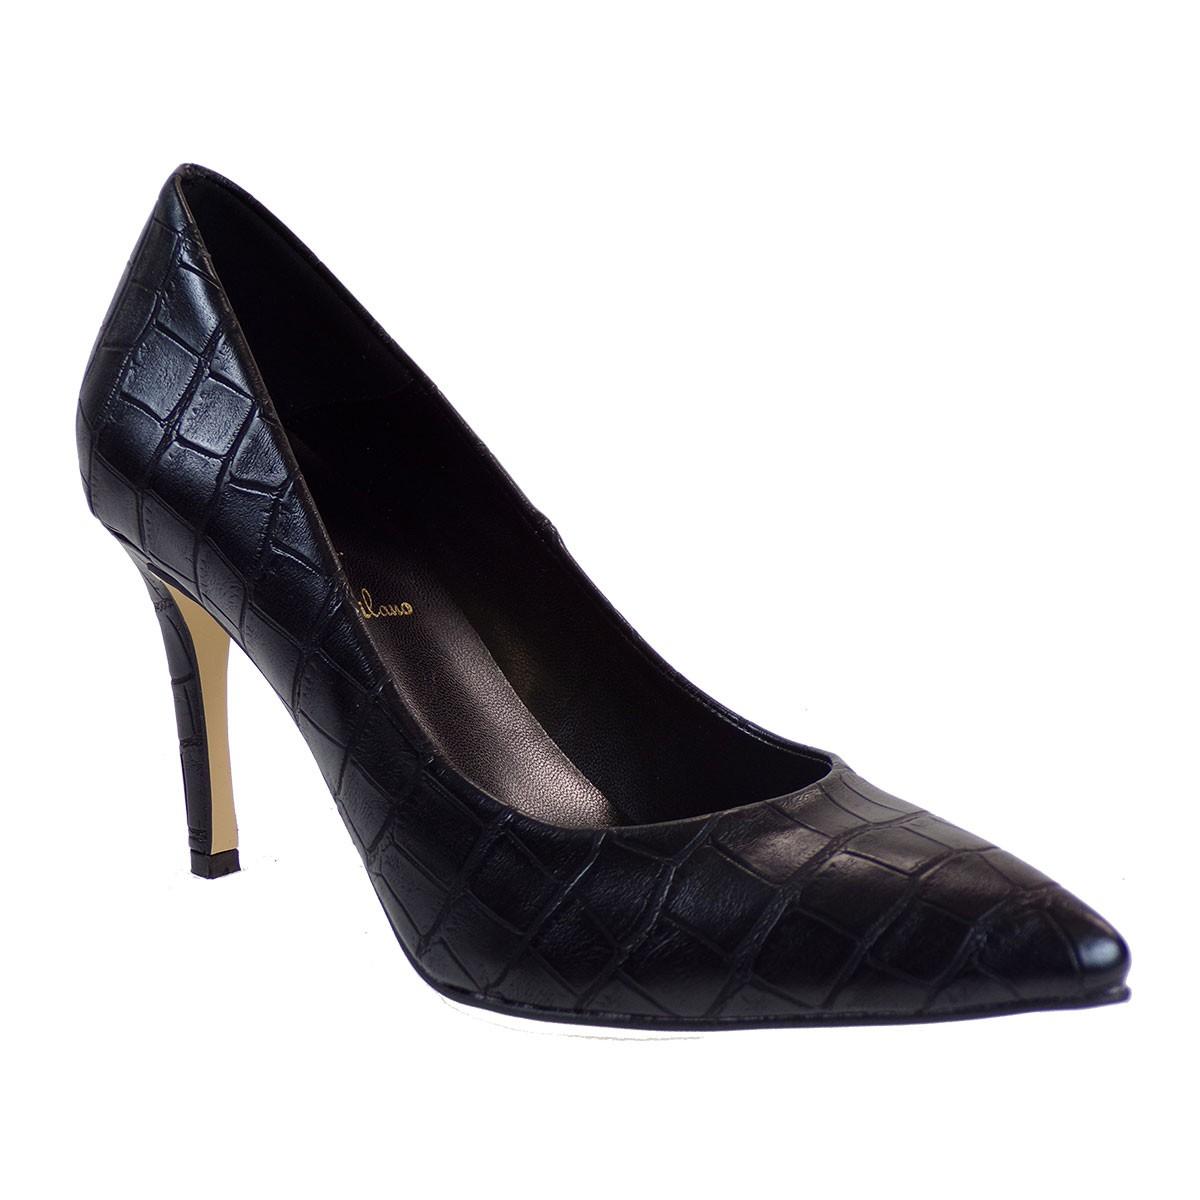 Alessandra Paggioti Γυναικεία Παπούτσια Γόβες 81001 Μαύρο Κροκό